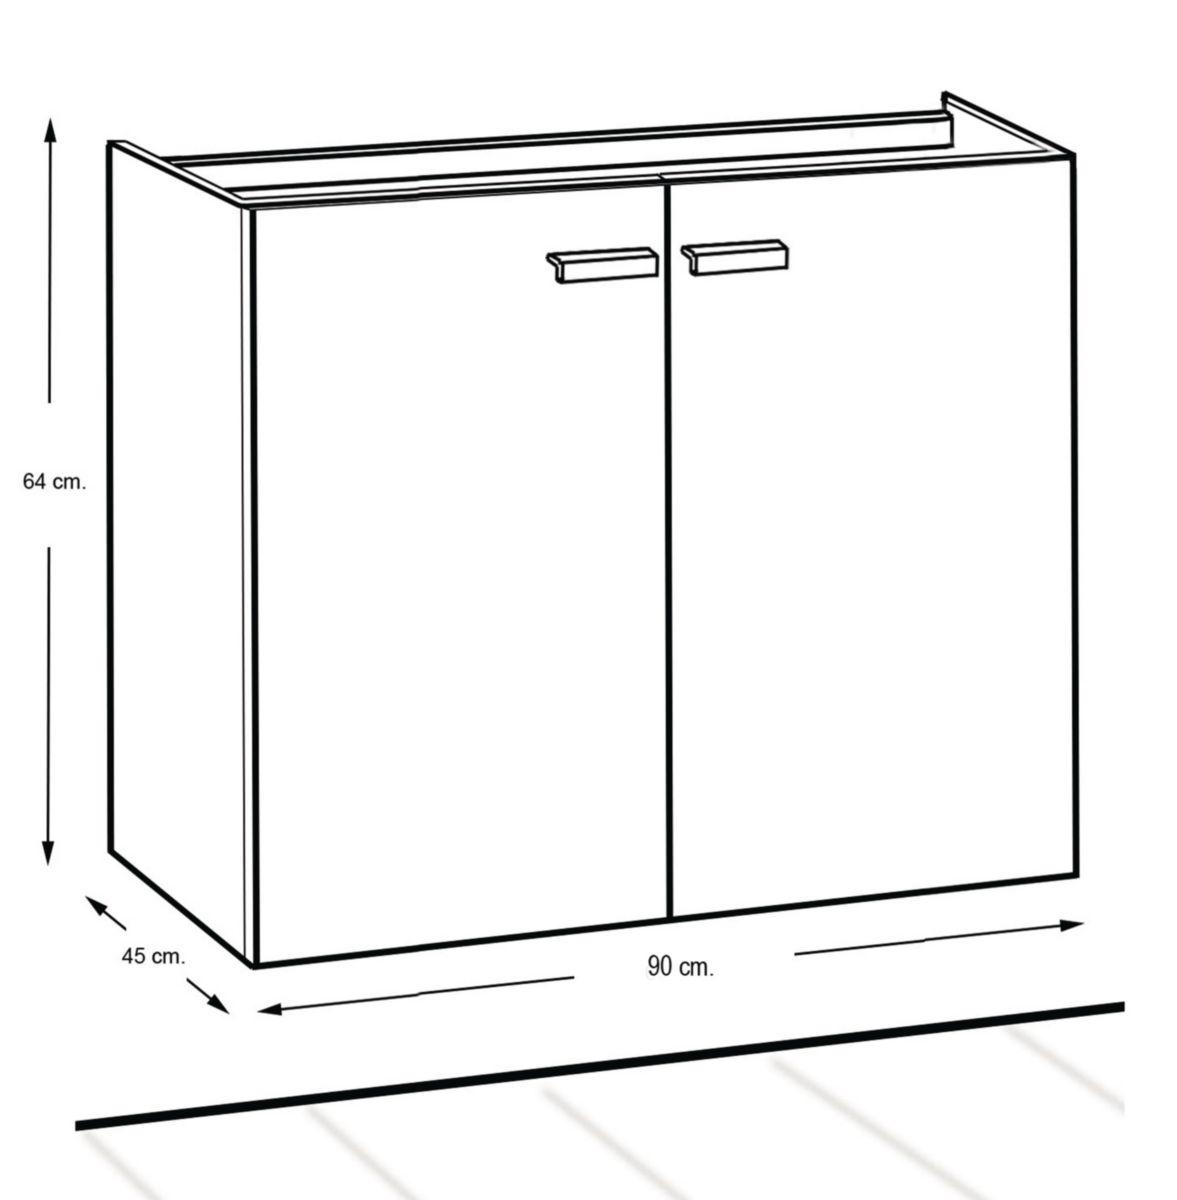 Meuble WOODSTOCK 2 portes fuschia 90 cm